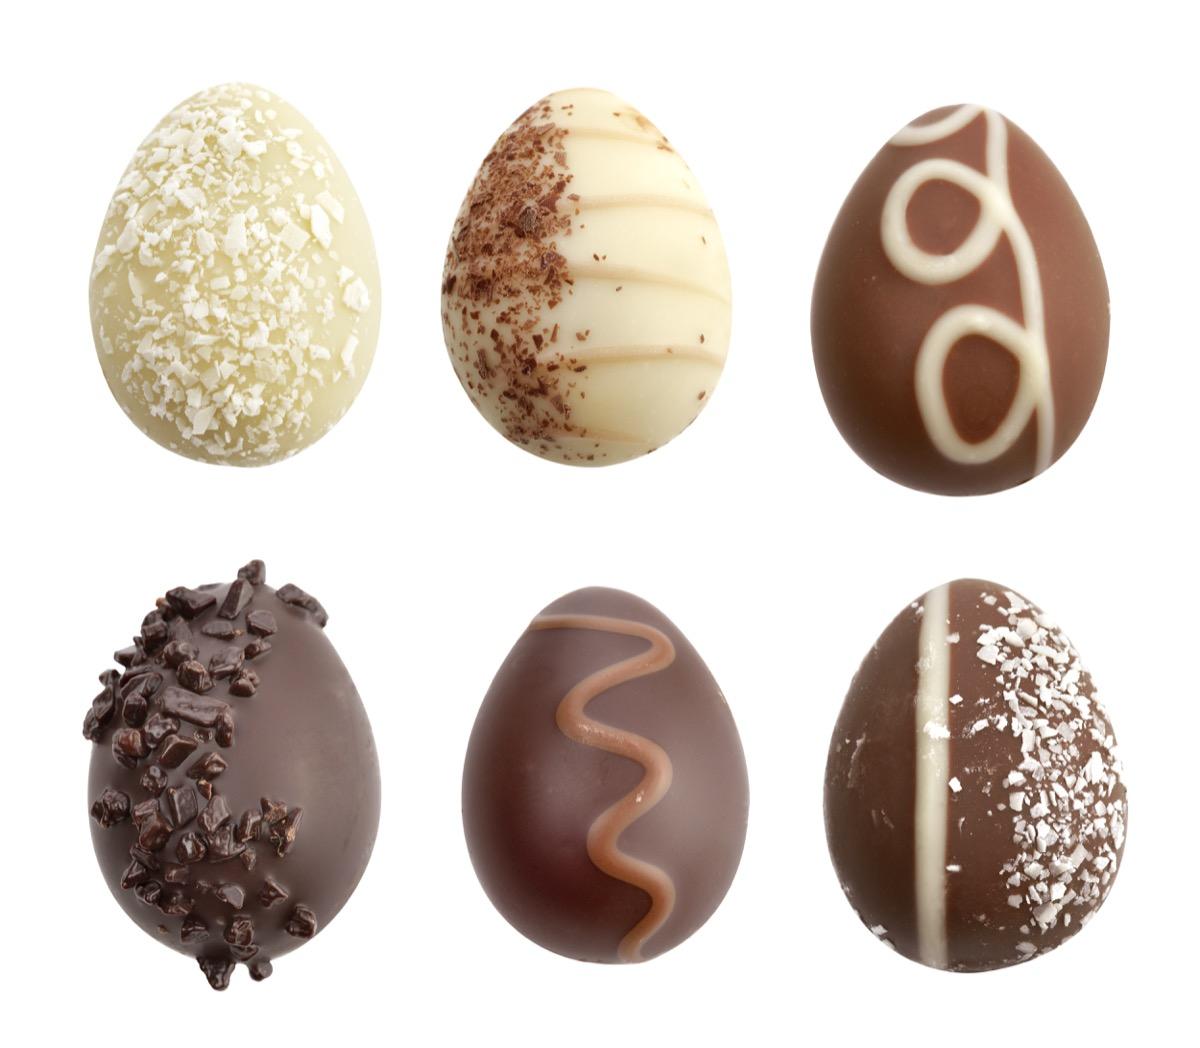 white chocolate eggs, dark chocolate easter eggs